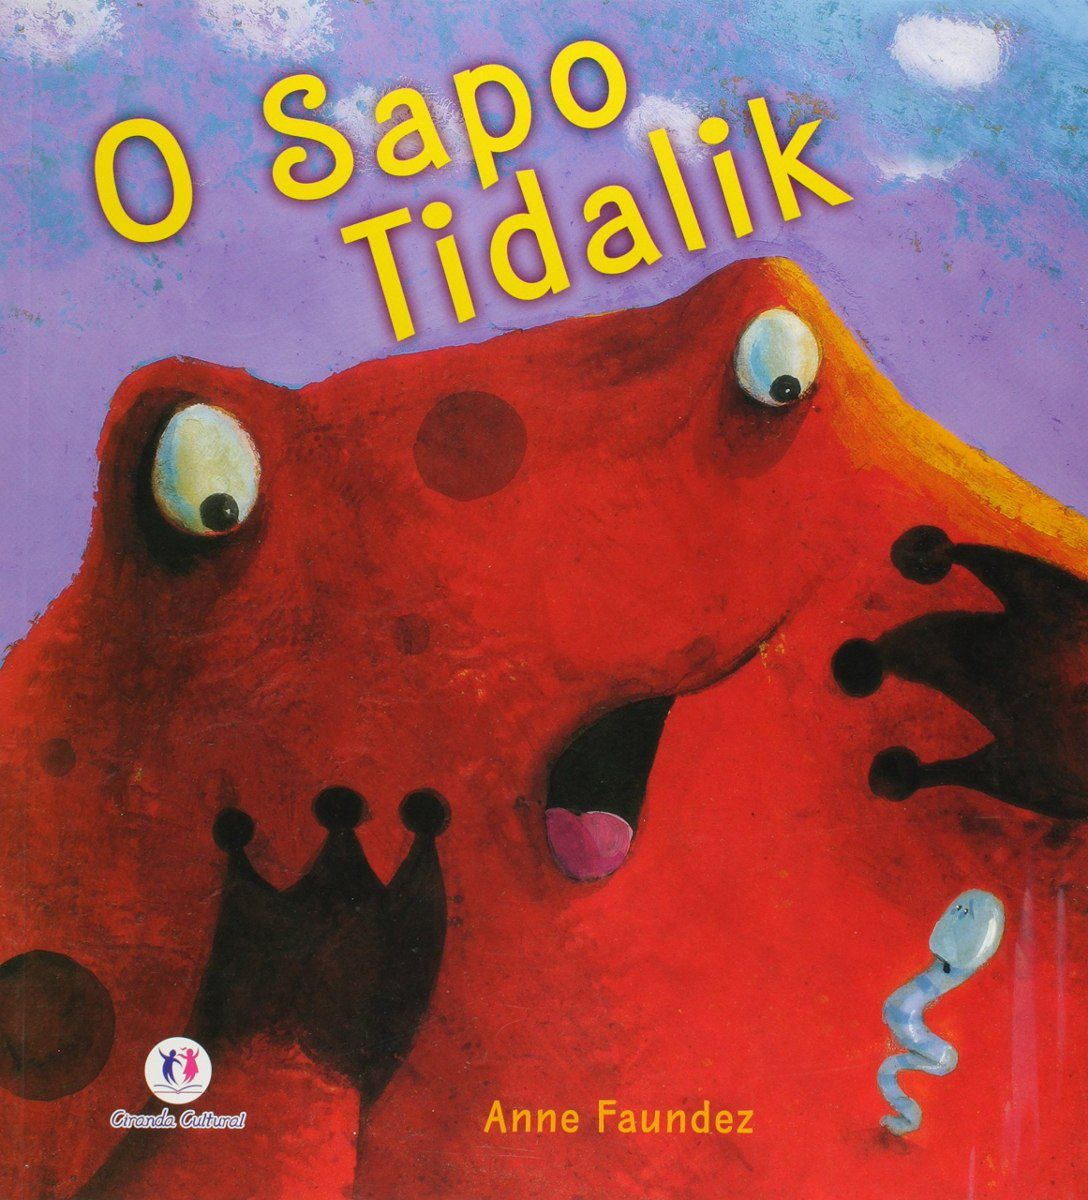 O SAPO TIDALIK